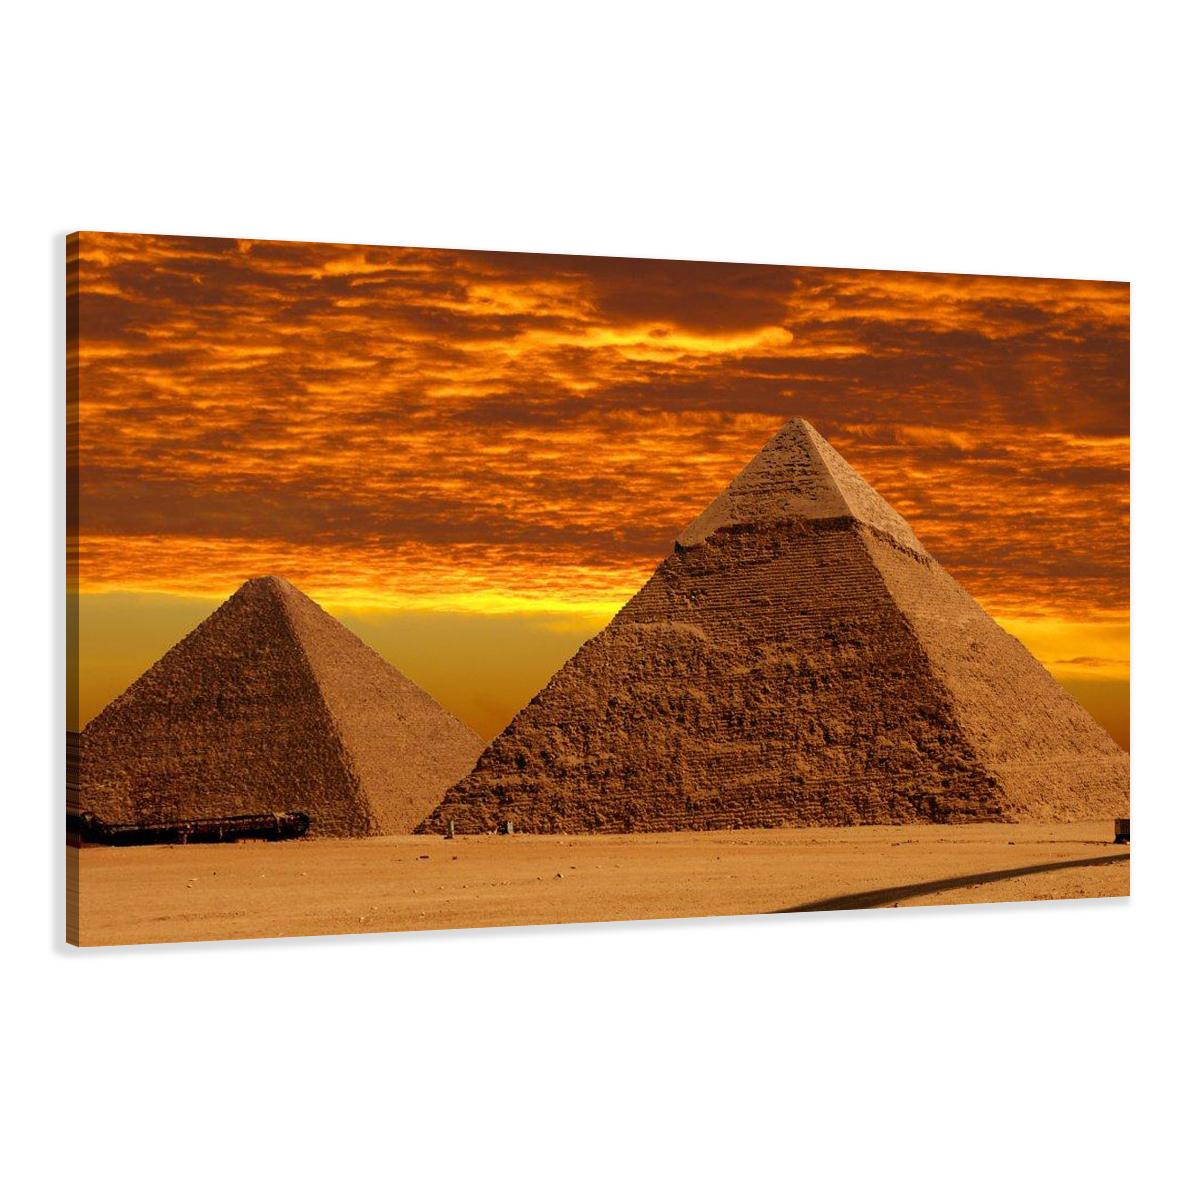 Leinwand wandbilder verschiedene bilder motive 120 x 80 cm - Leinwand motive ...